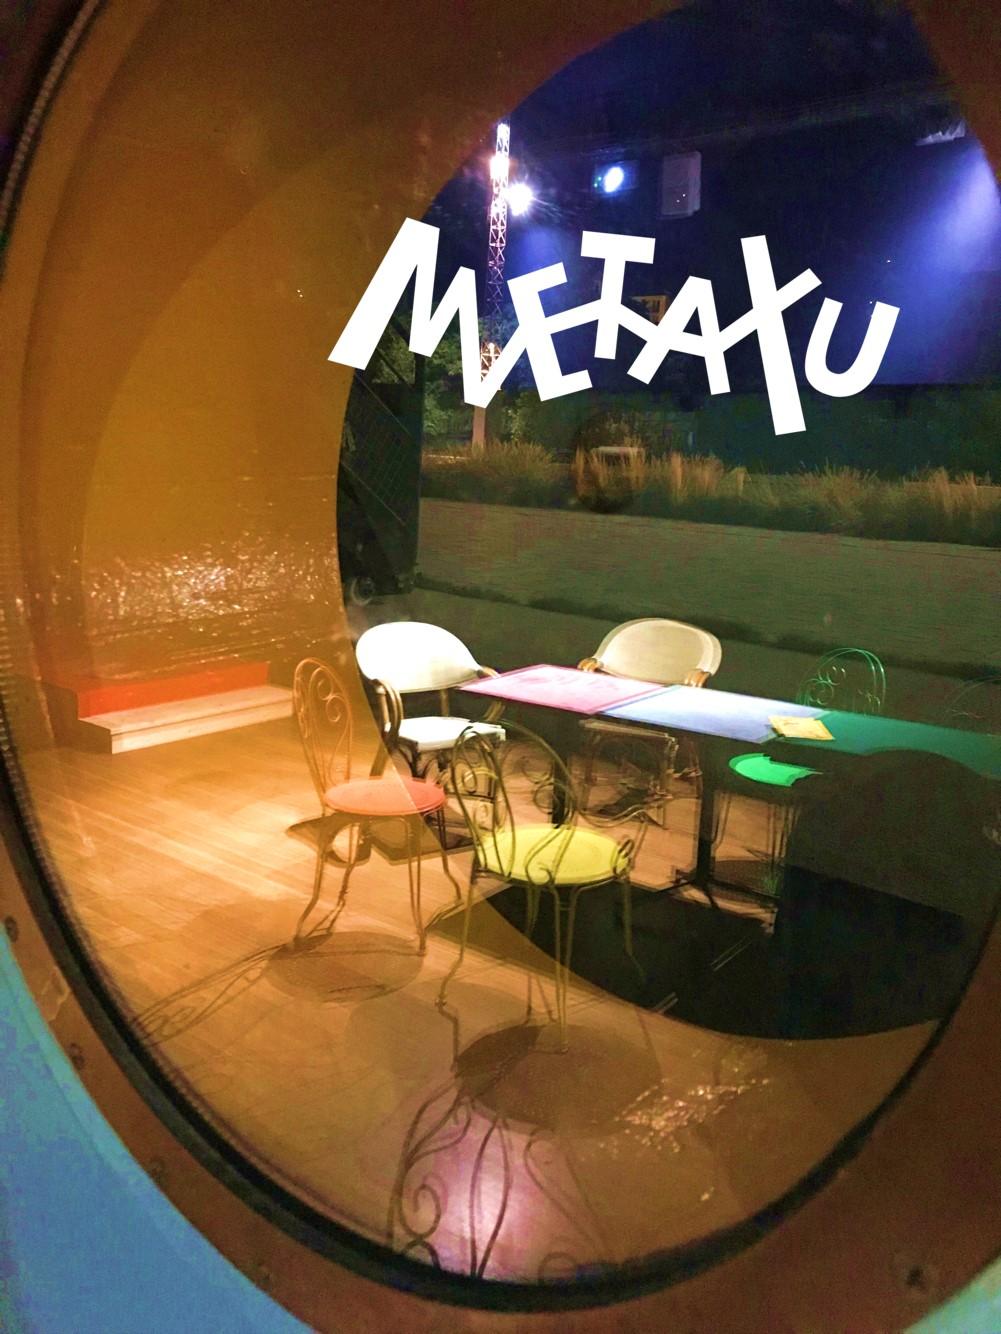 Table réservée Metaxu